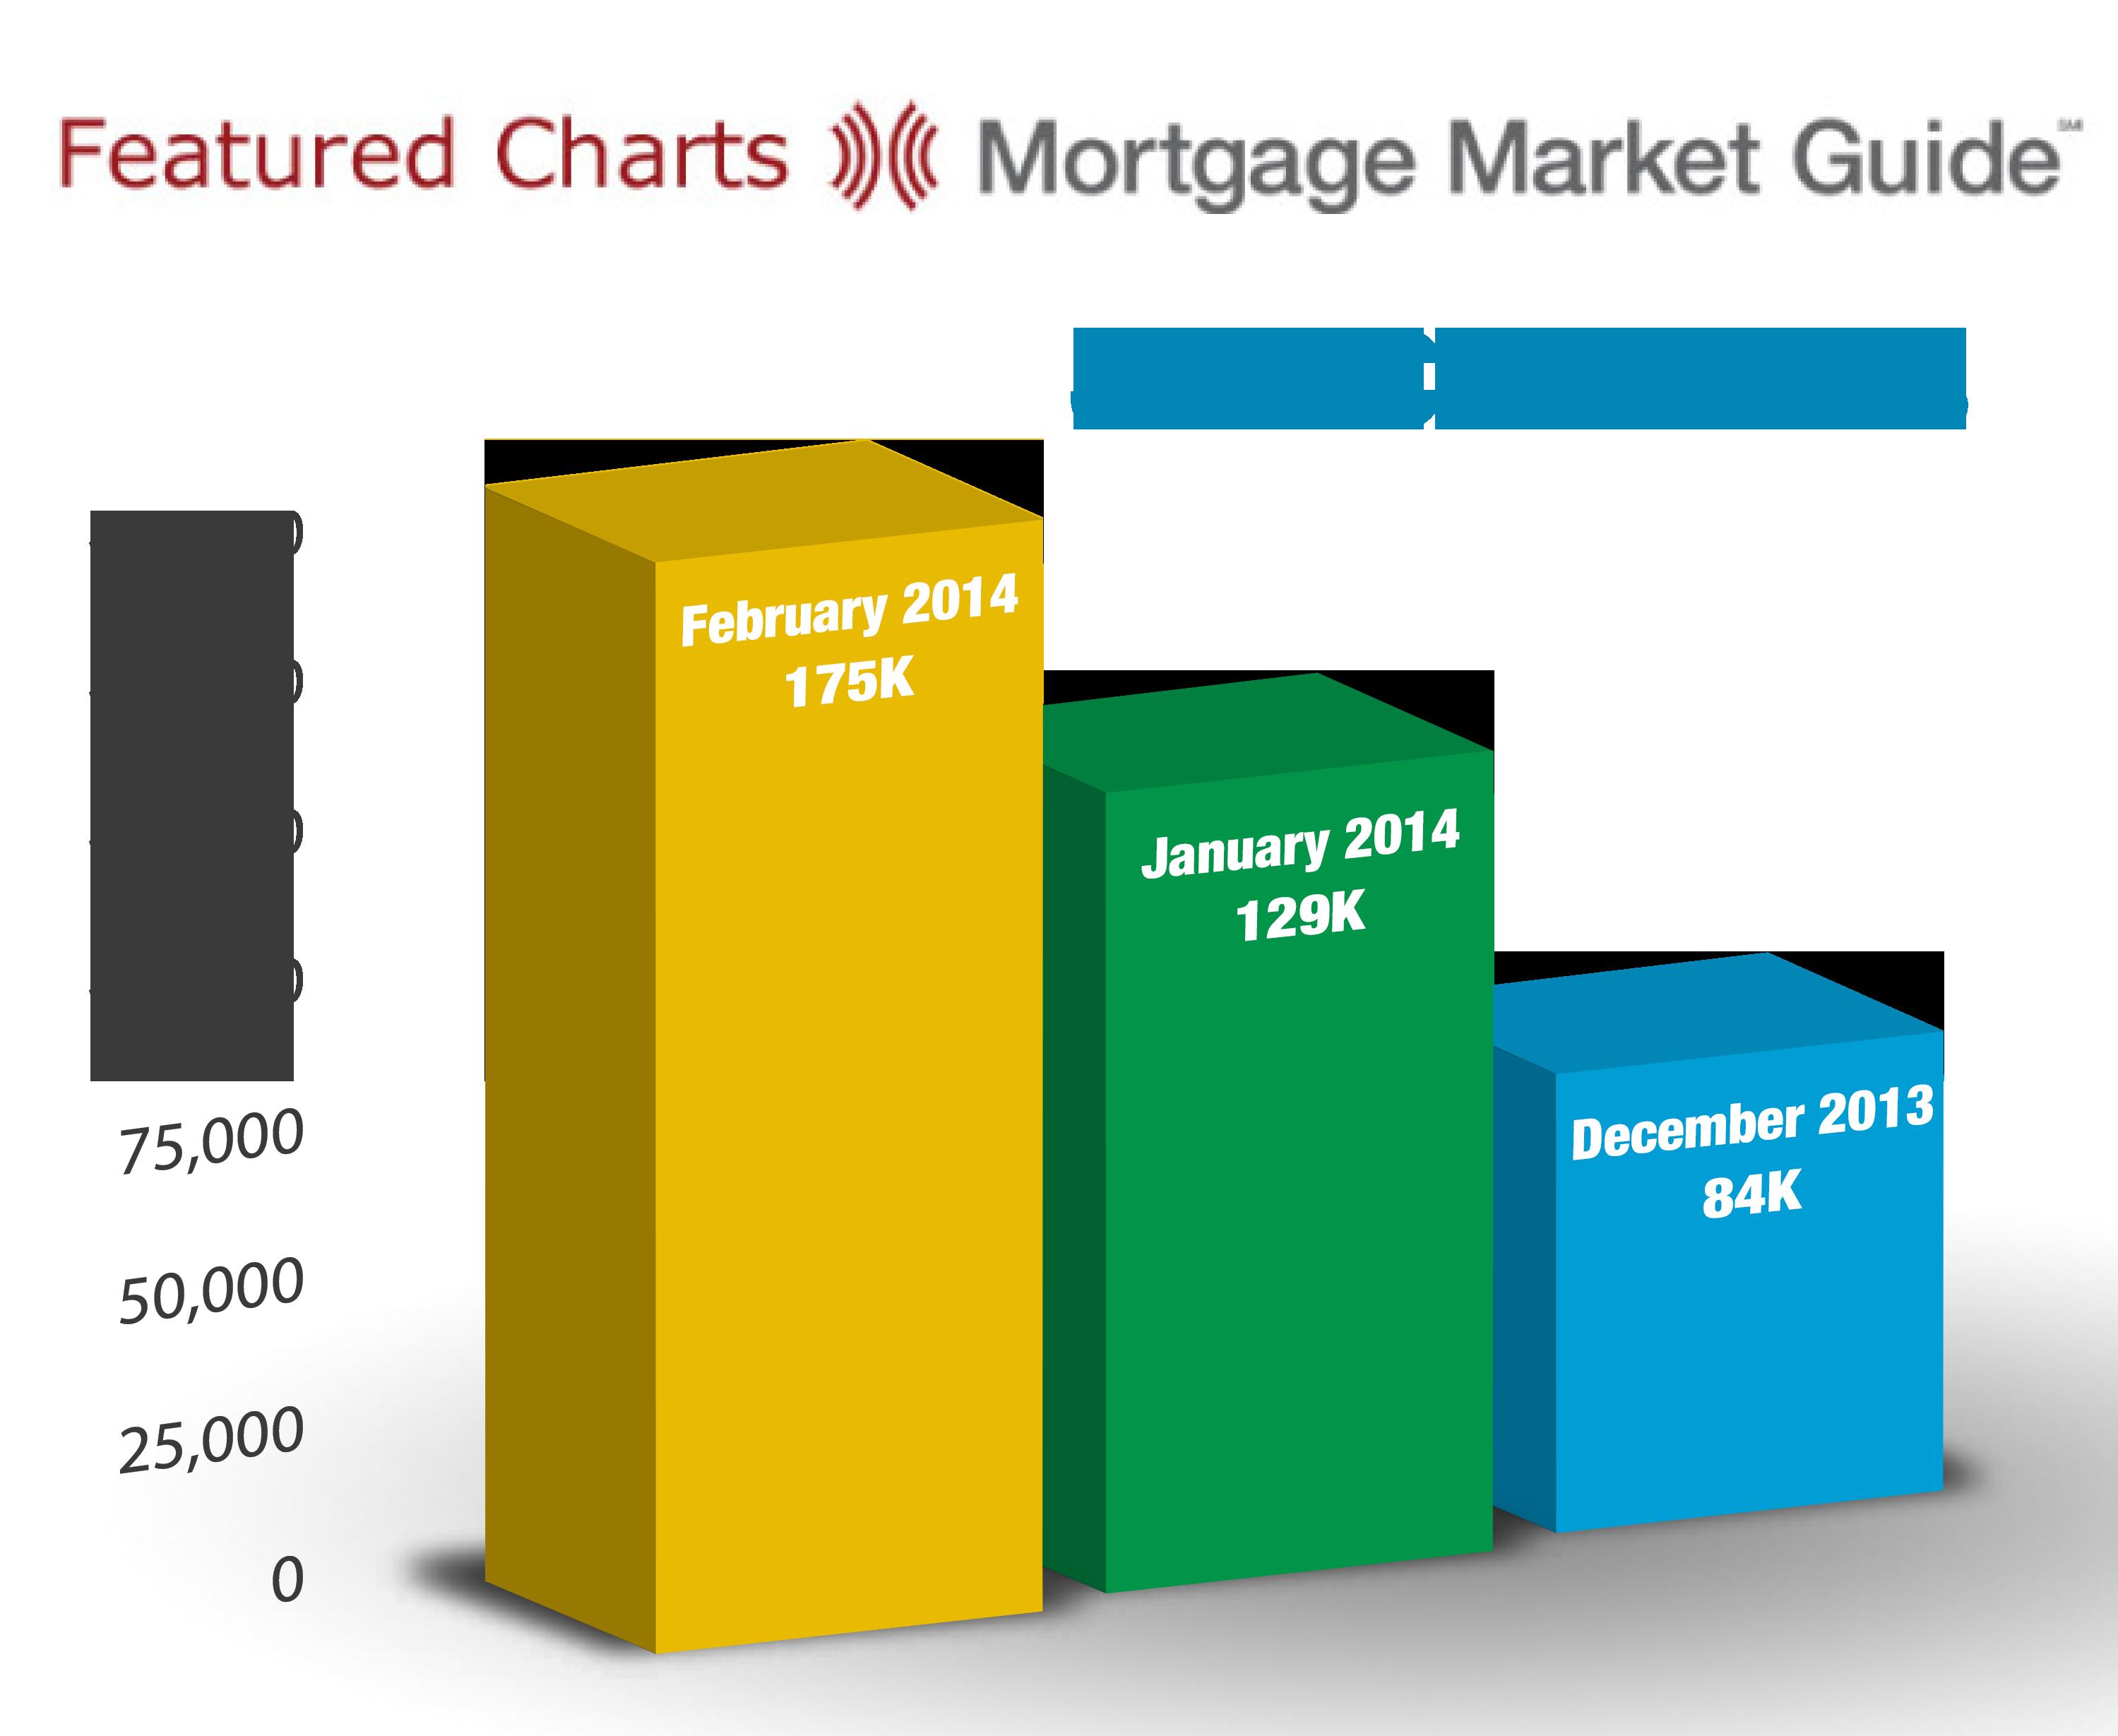 JOB CREATIONS: DECEMBER 2013 – FEBRUARY2014